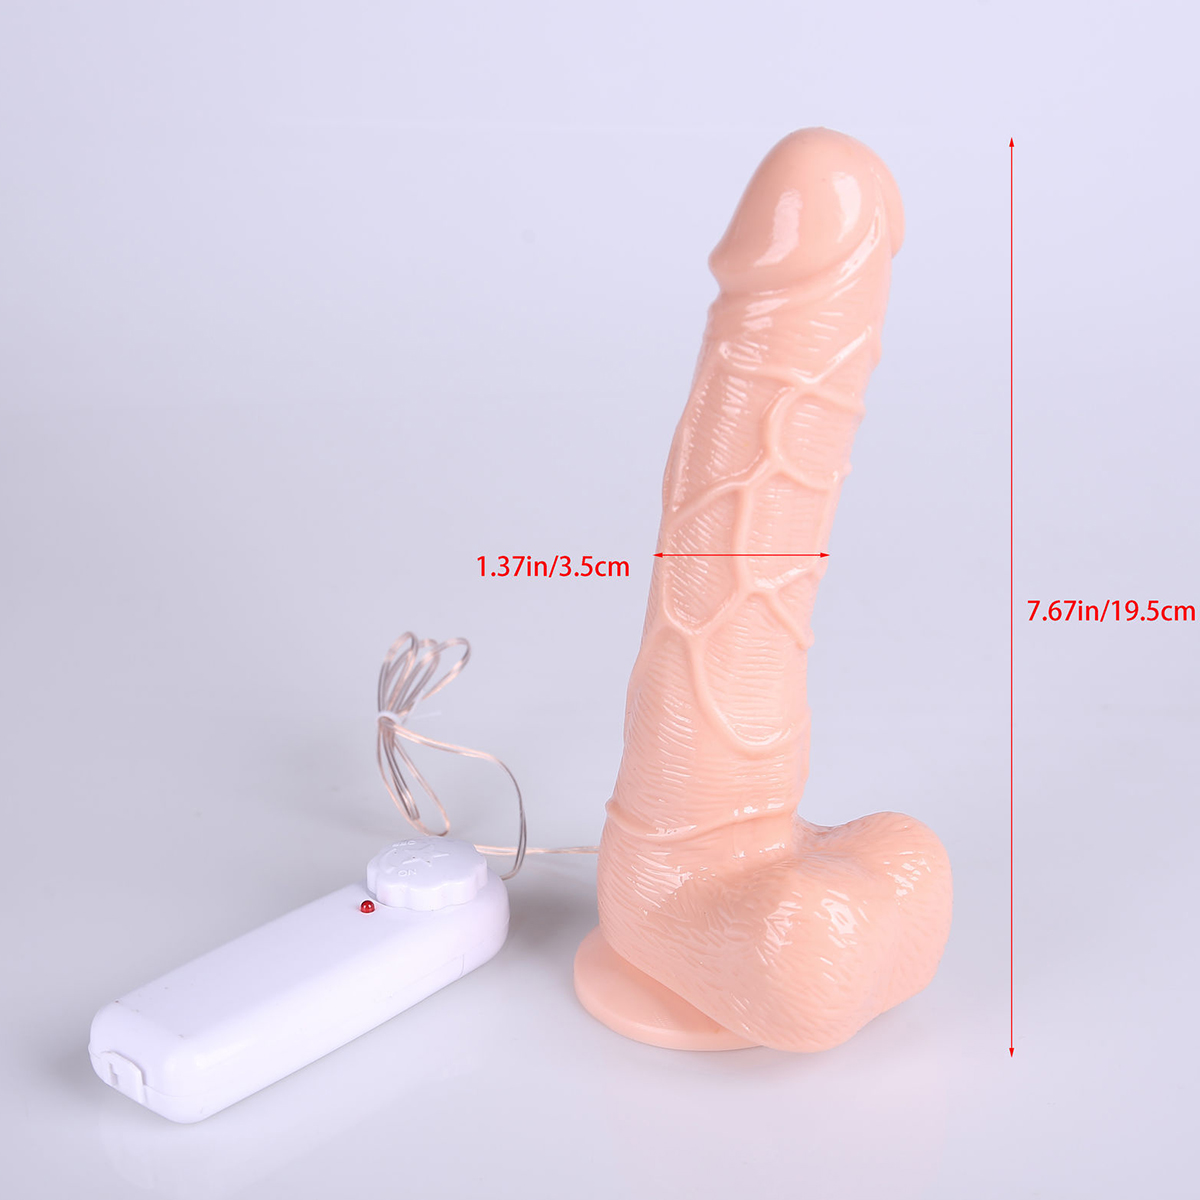 Big Penis Vibrator Flexible Realistic Suction Cup Dildo